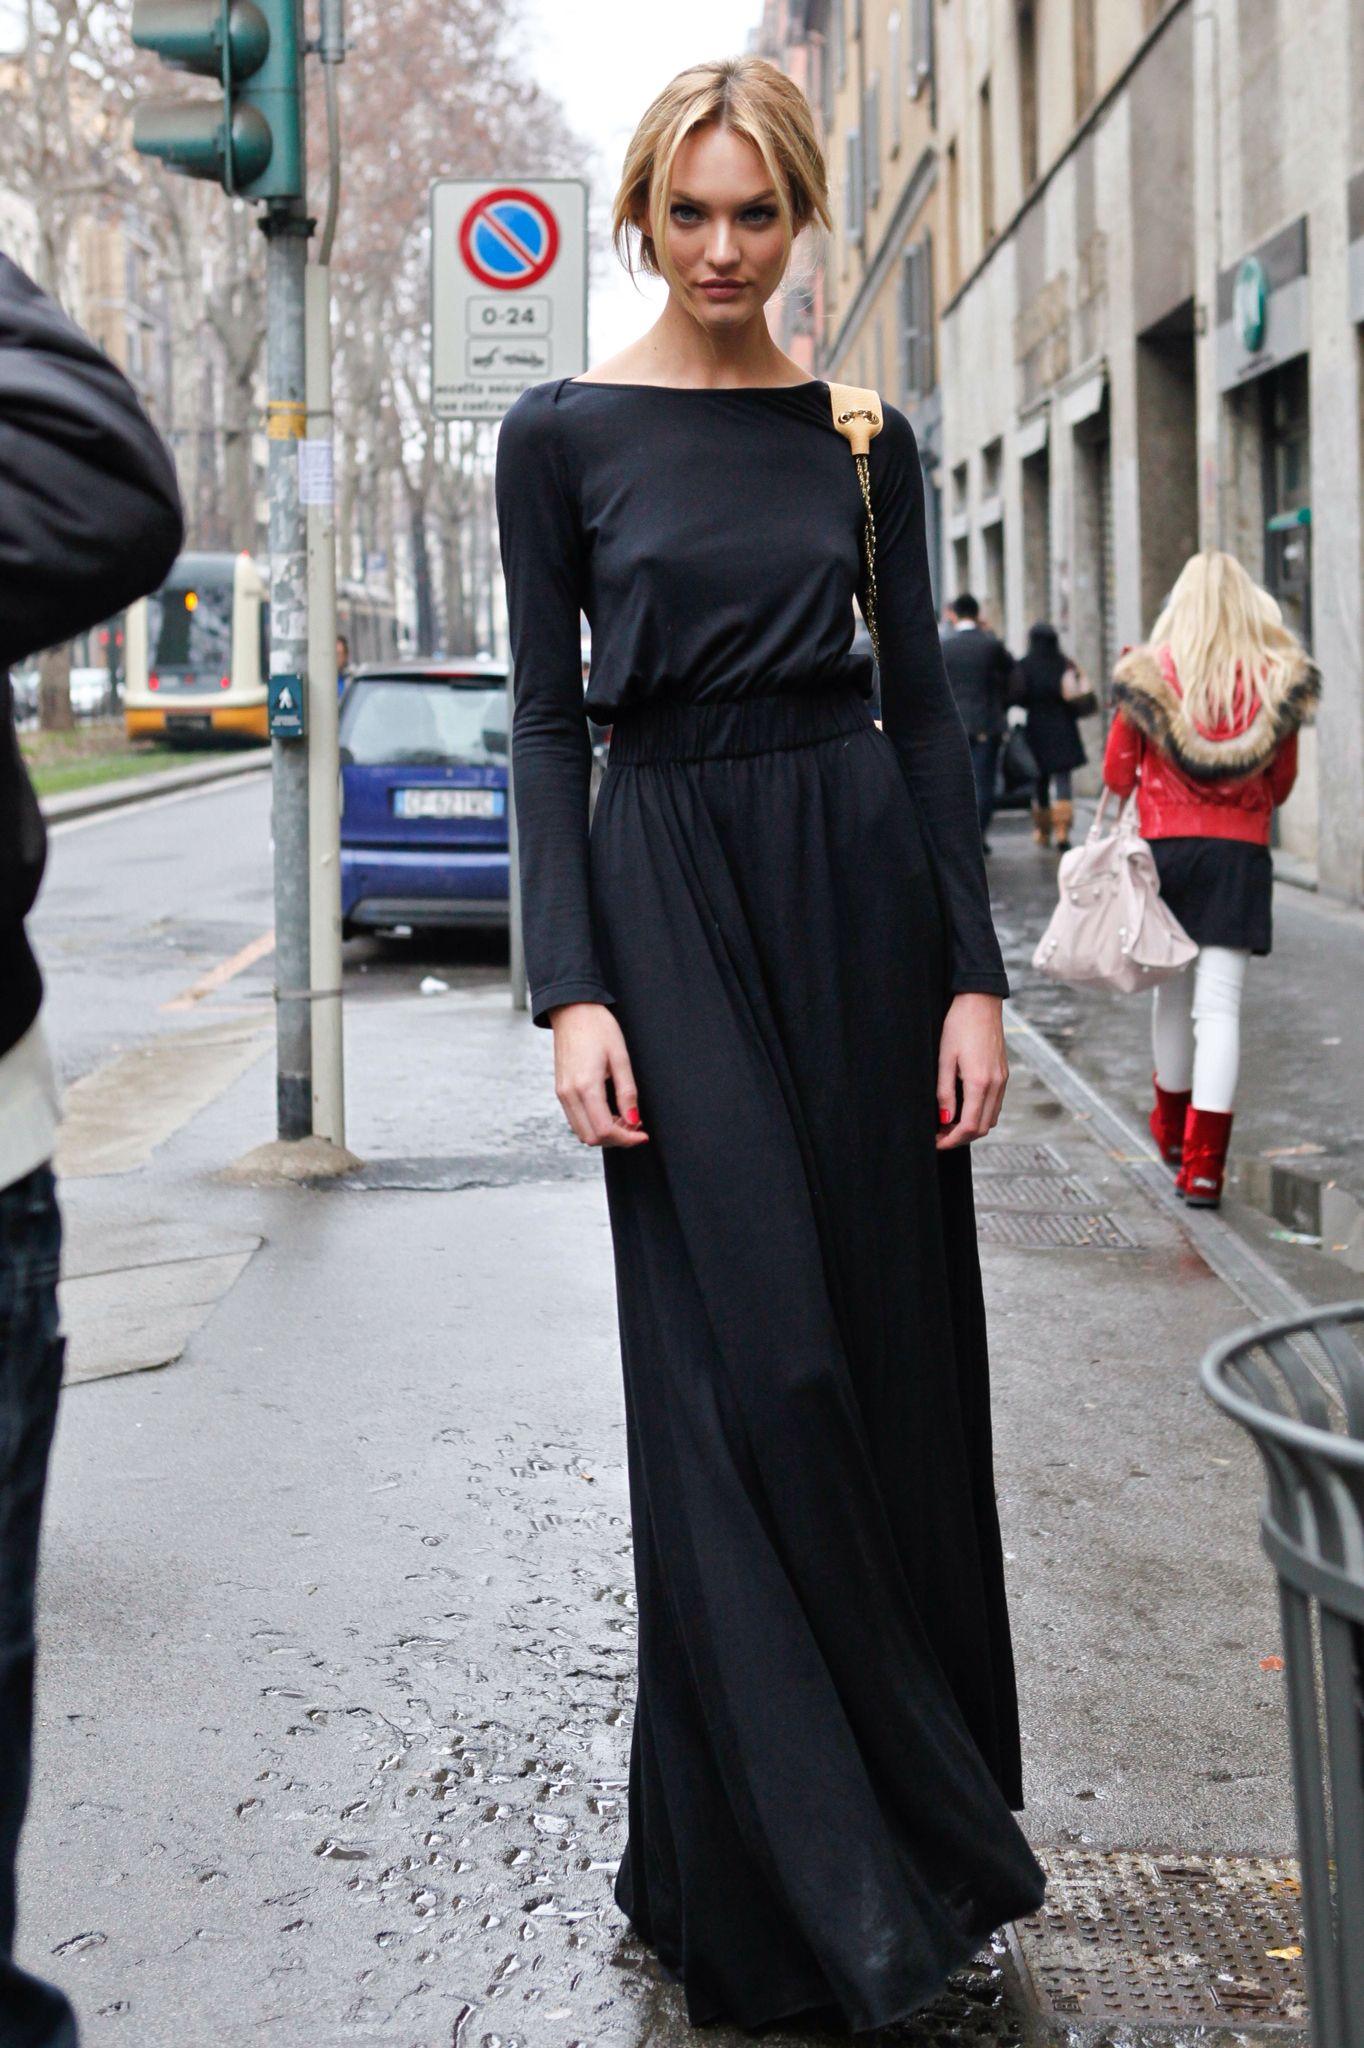 Candice swanepoel long black dress